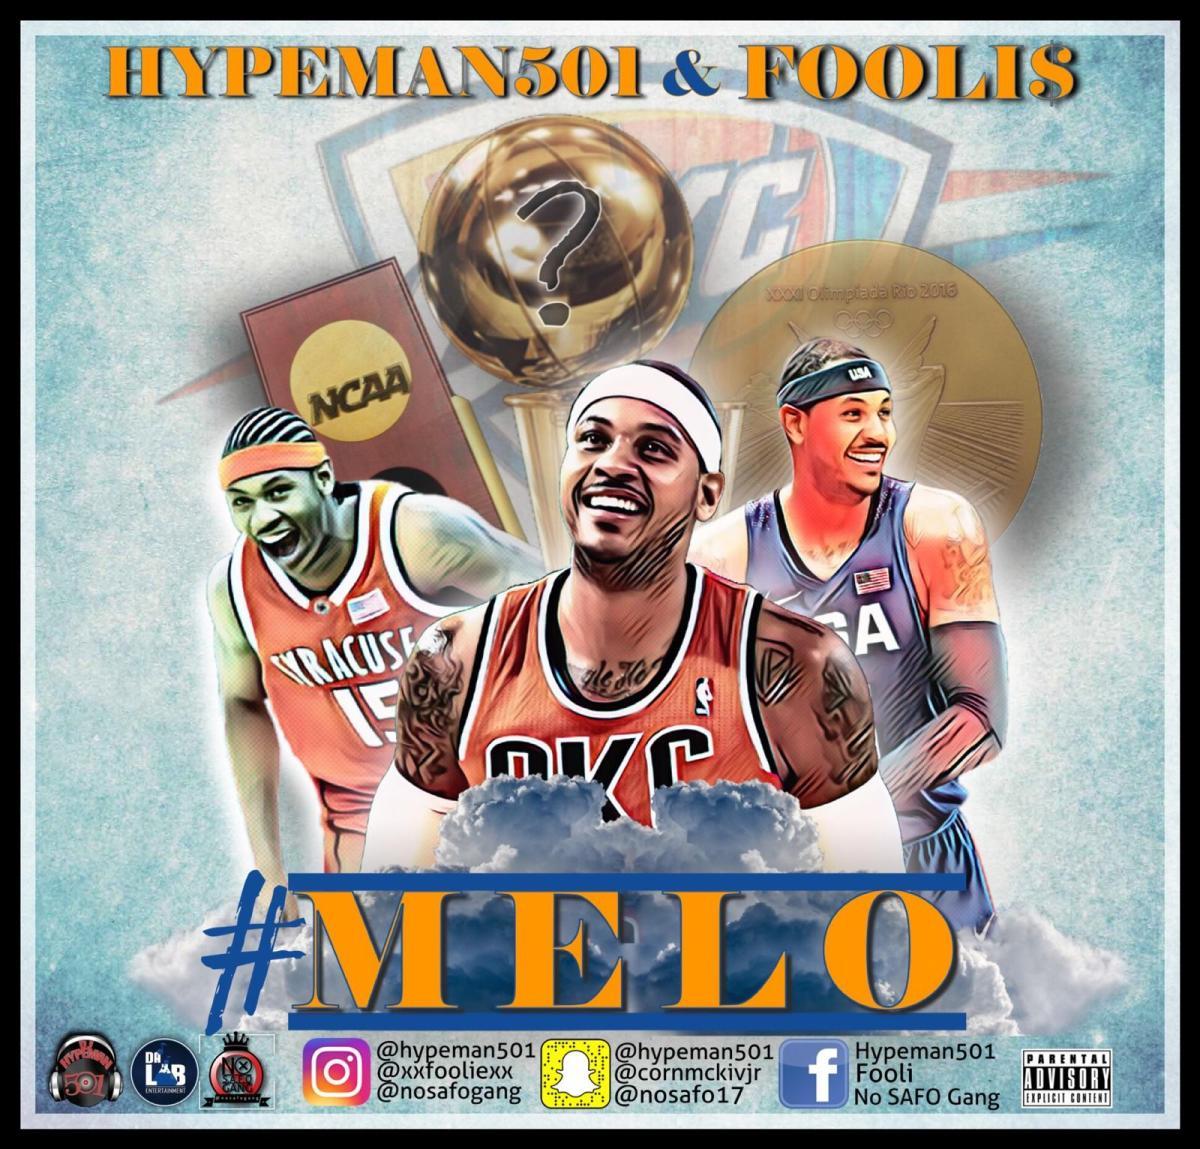 DJ Hypeman501 (@Hypeman501) & Fooli$ - Melo